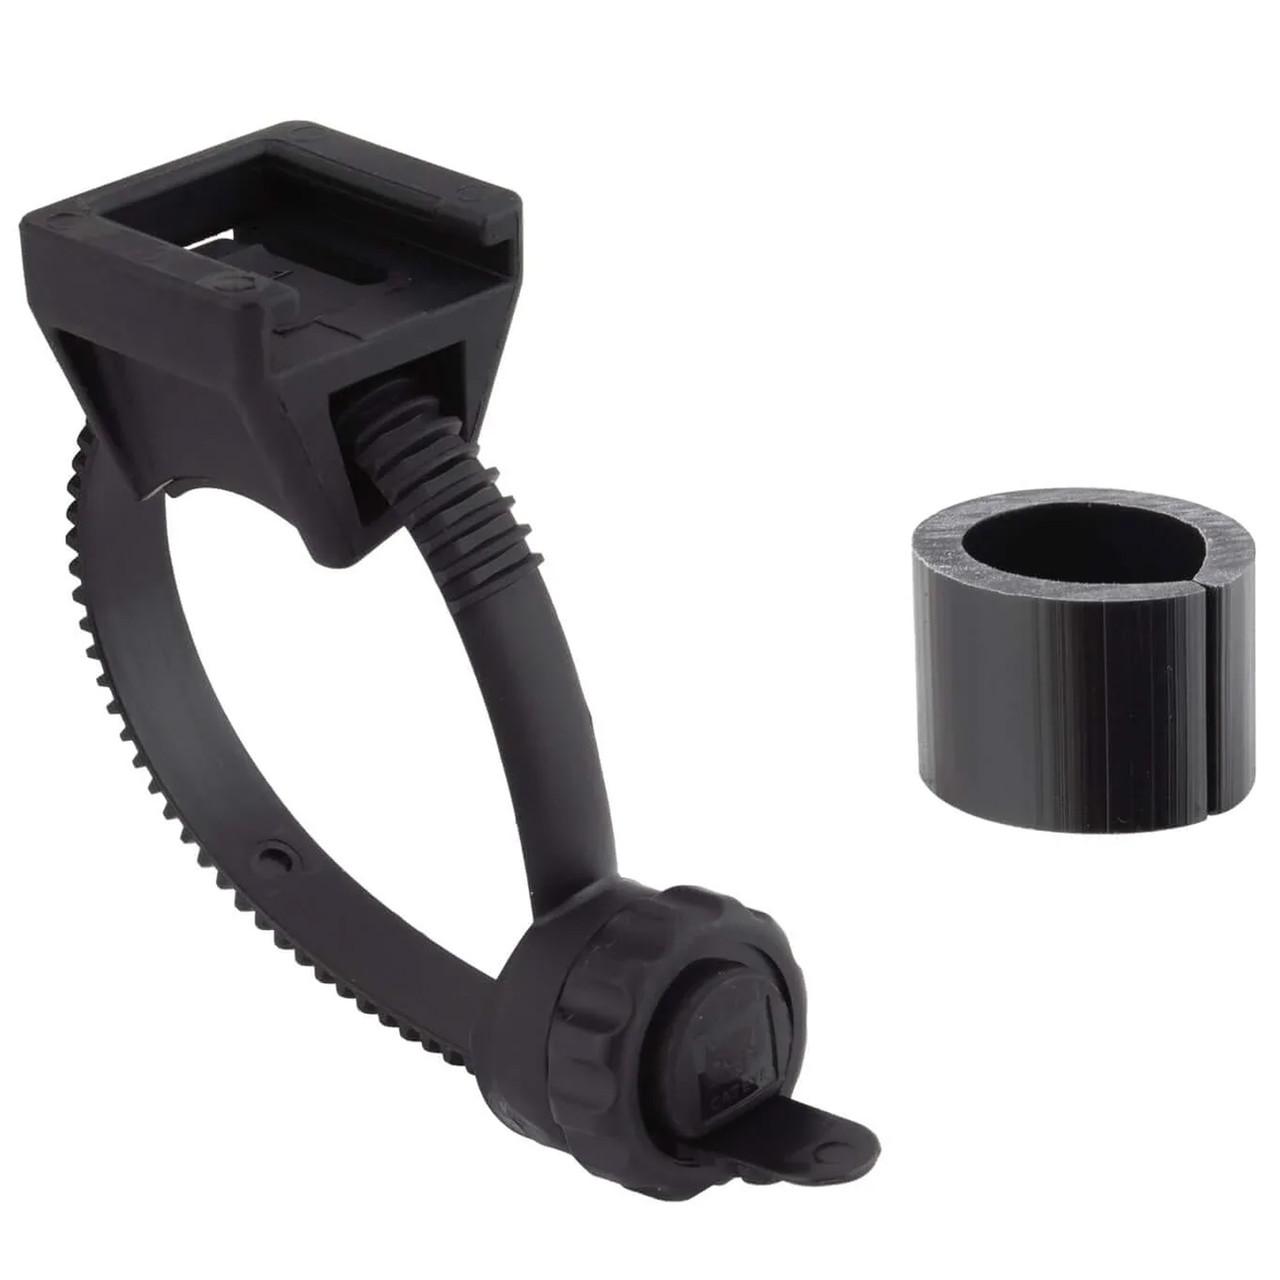 Cateye Accessory Bracket SP-12-F FlexTight Bracket